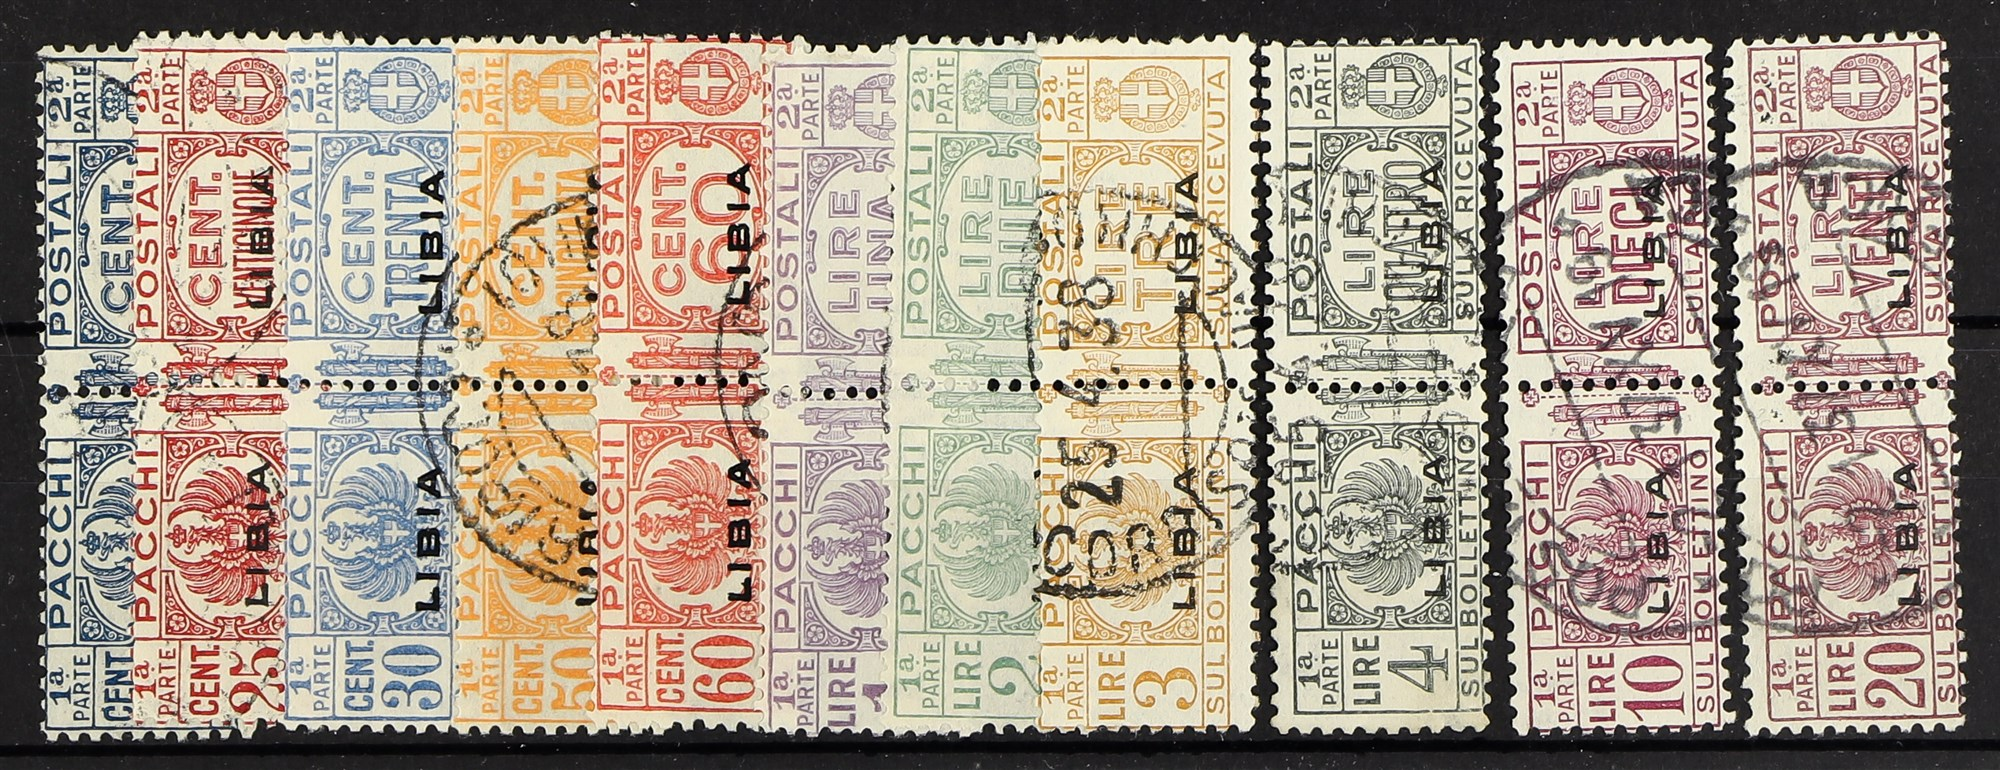 ITALIAN COLONIES LIBYA 1927-1937 Postage Due set complete, Sass S68, very fine used. Cat €3500 (£